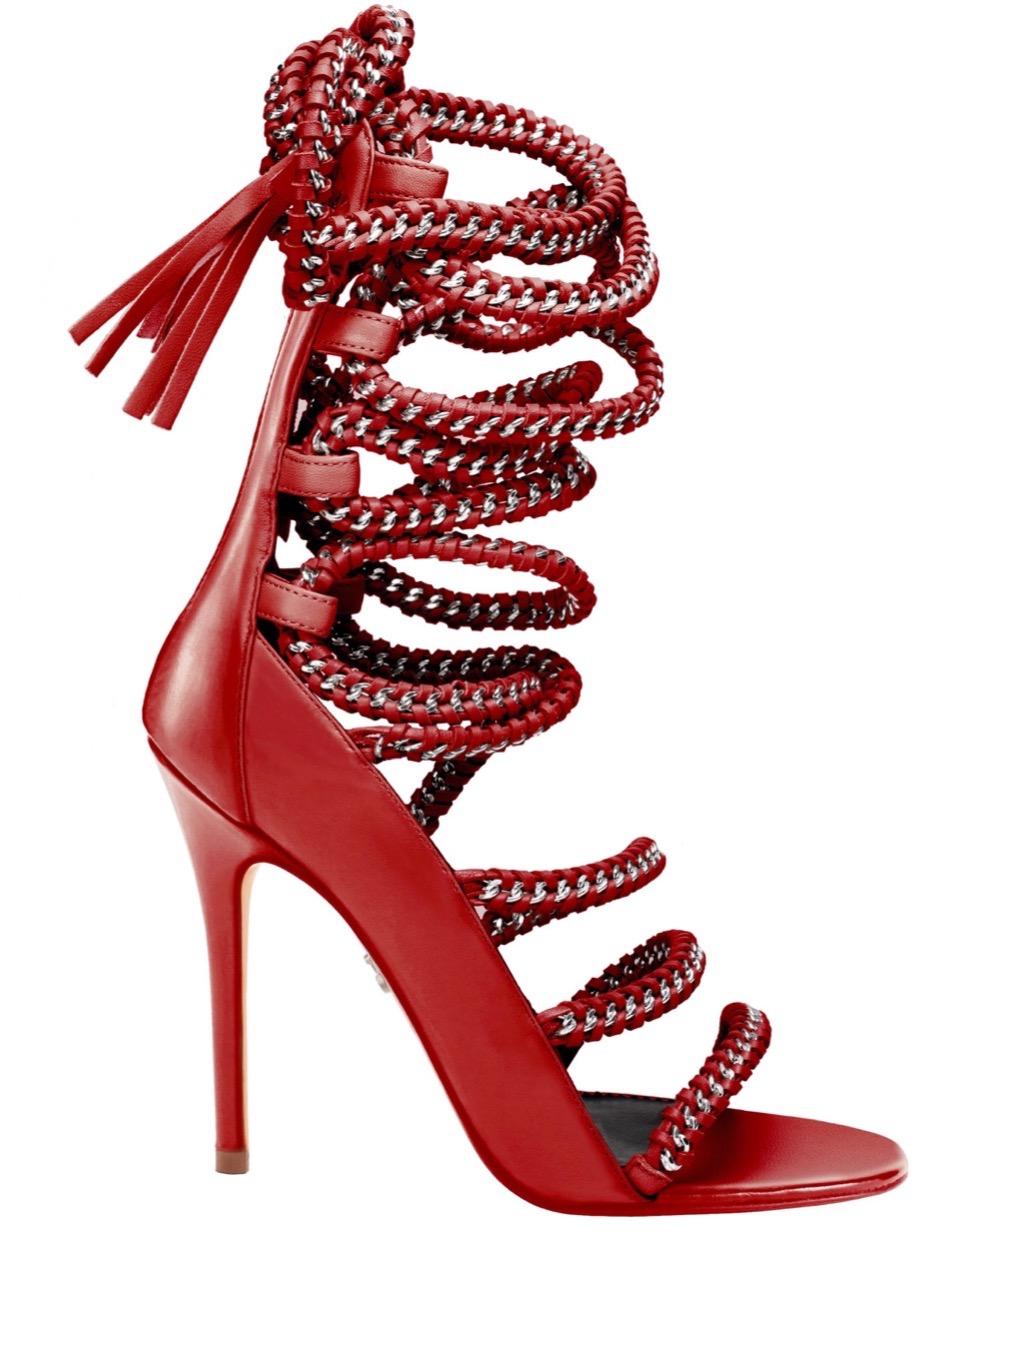 Monika Chiang heels.